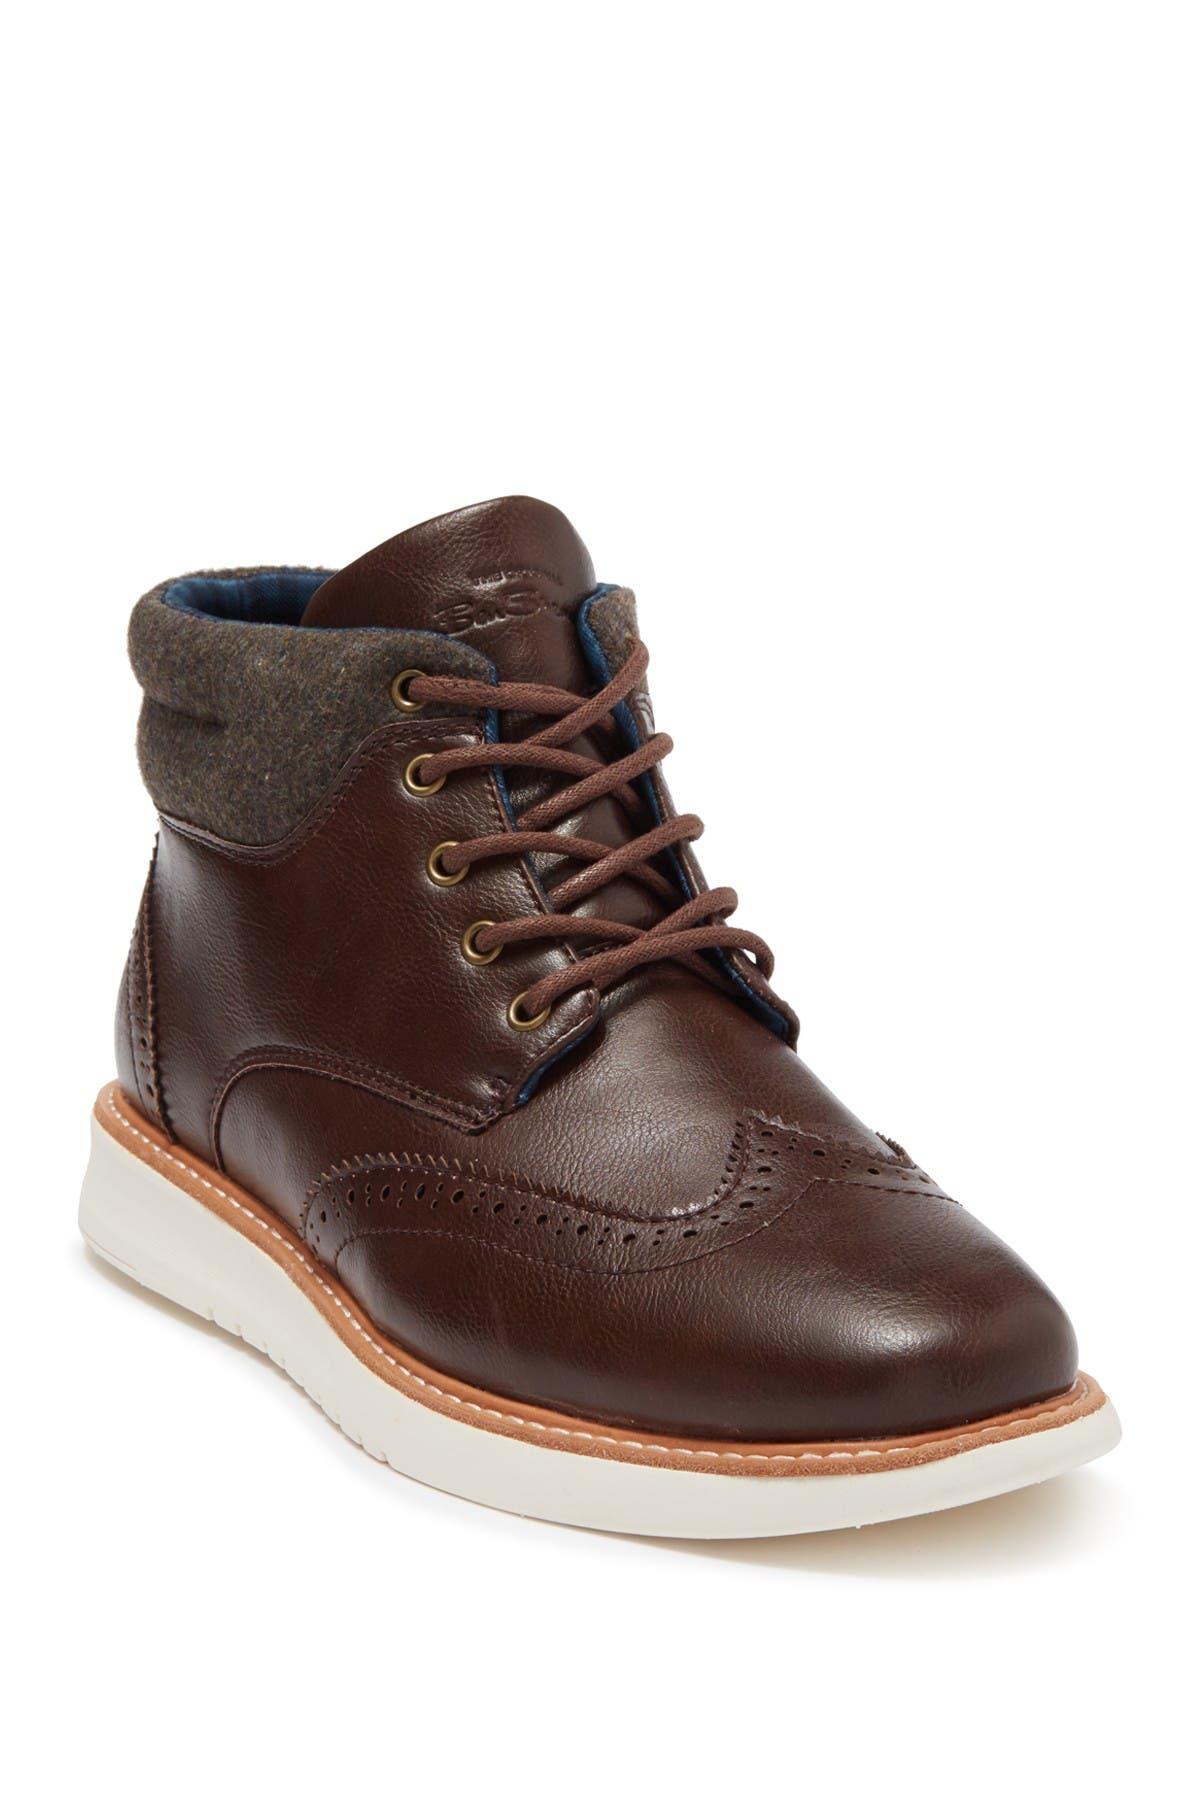 Image of Ben Sherman Omega Casual Boot